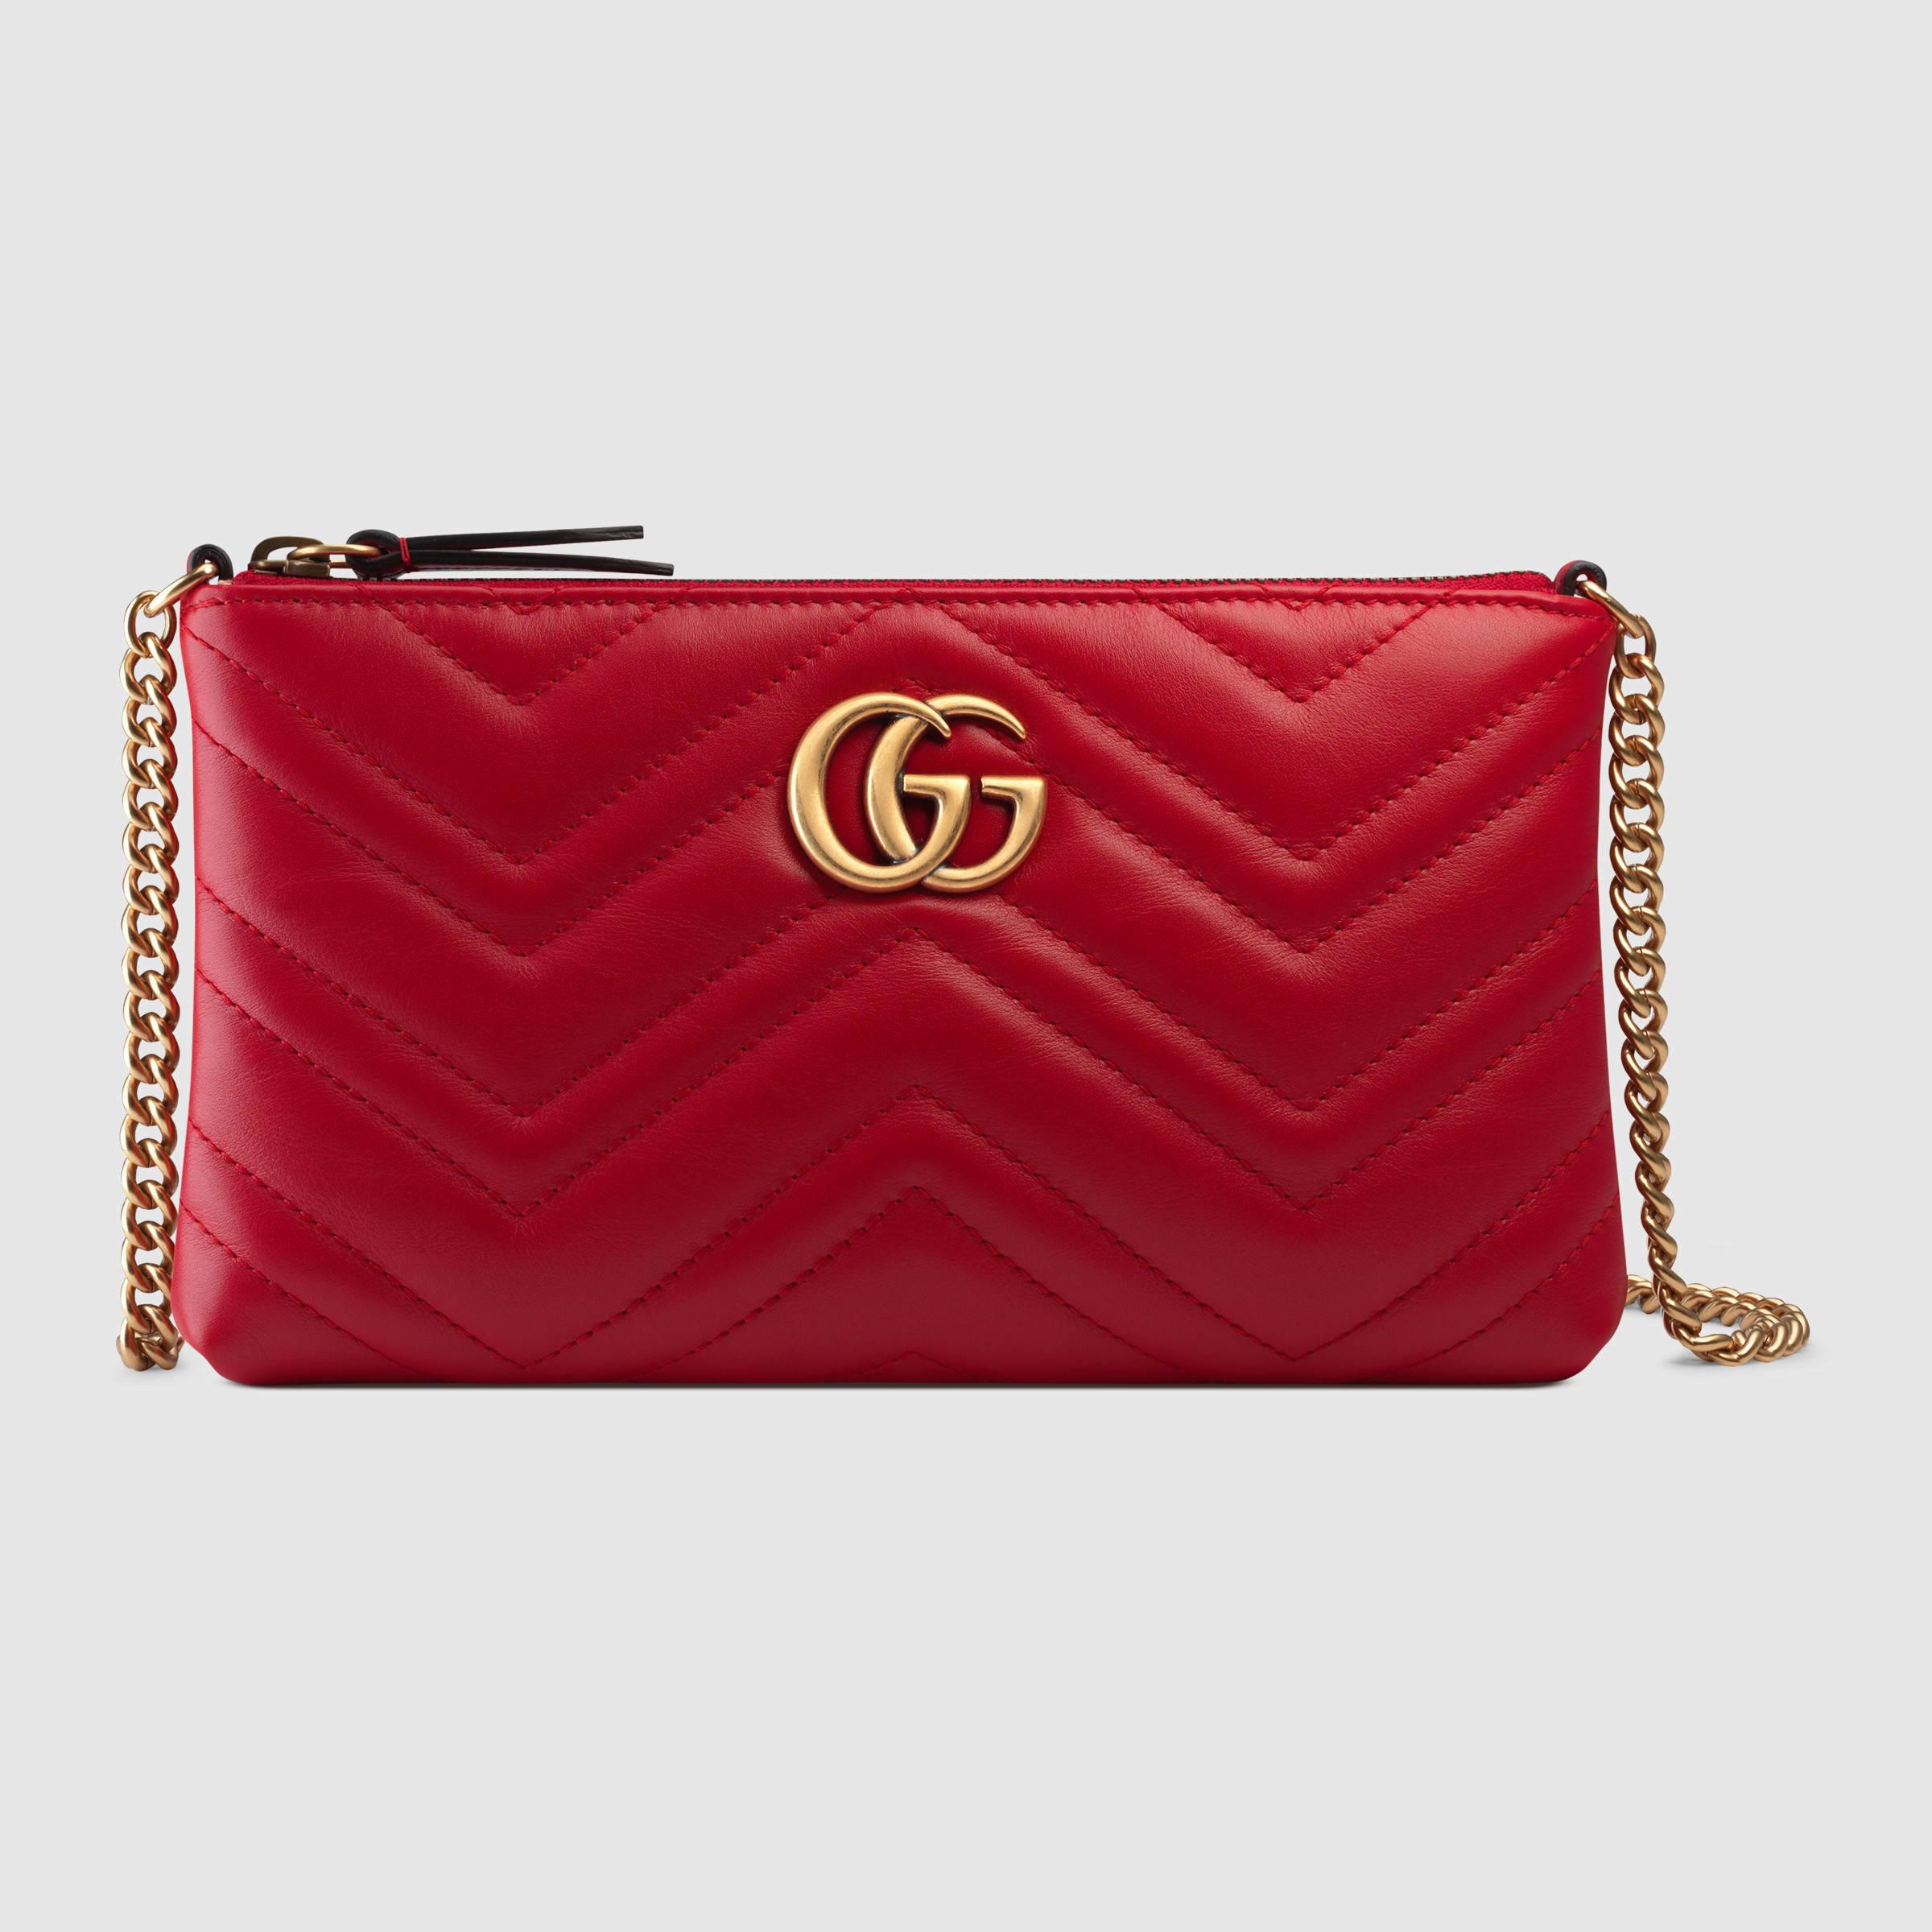 aea05e88b49b Gucci Marmont Mini Red Bag. Gucci GG Marmont Matelassé Leather Mini Shoulder  Bag in Red | Lyst